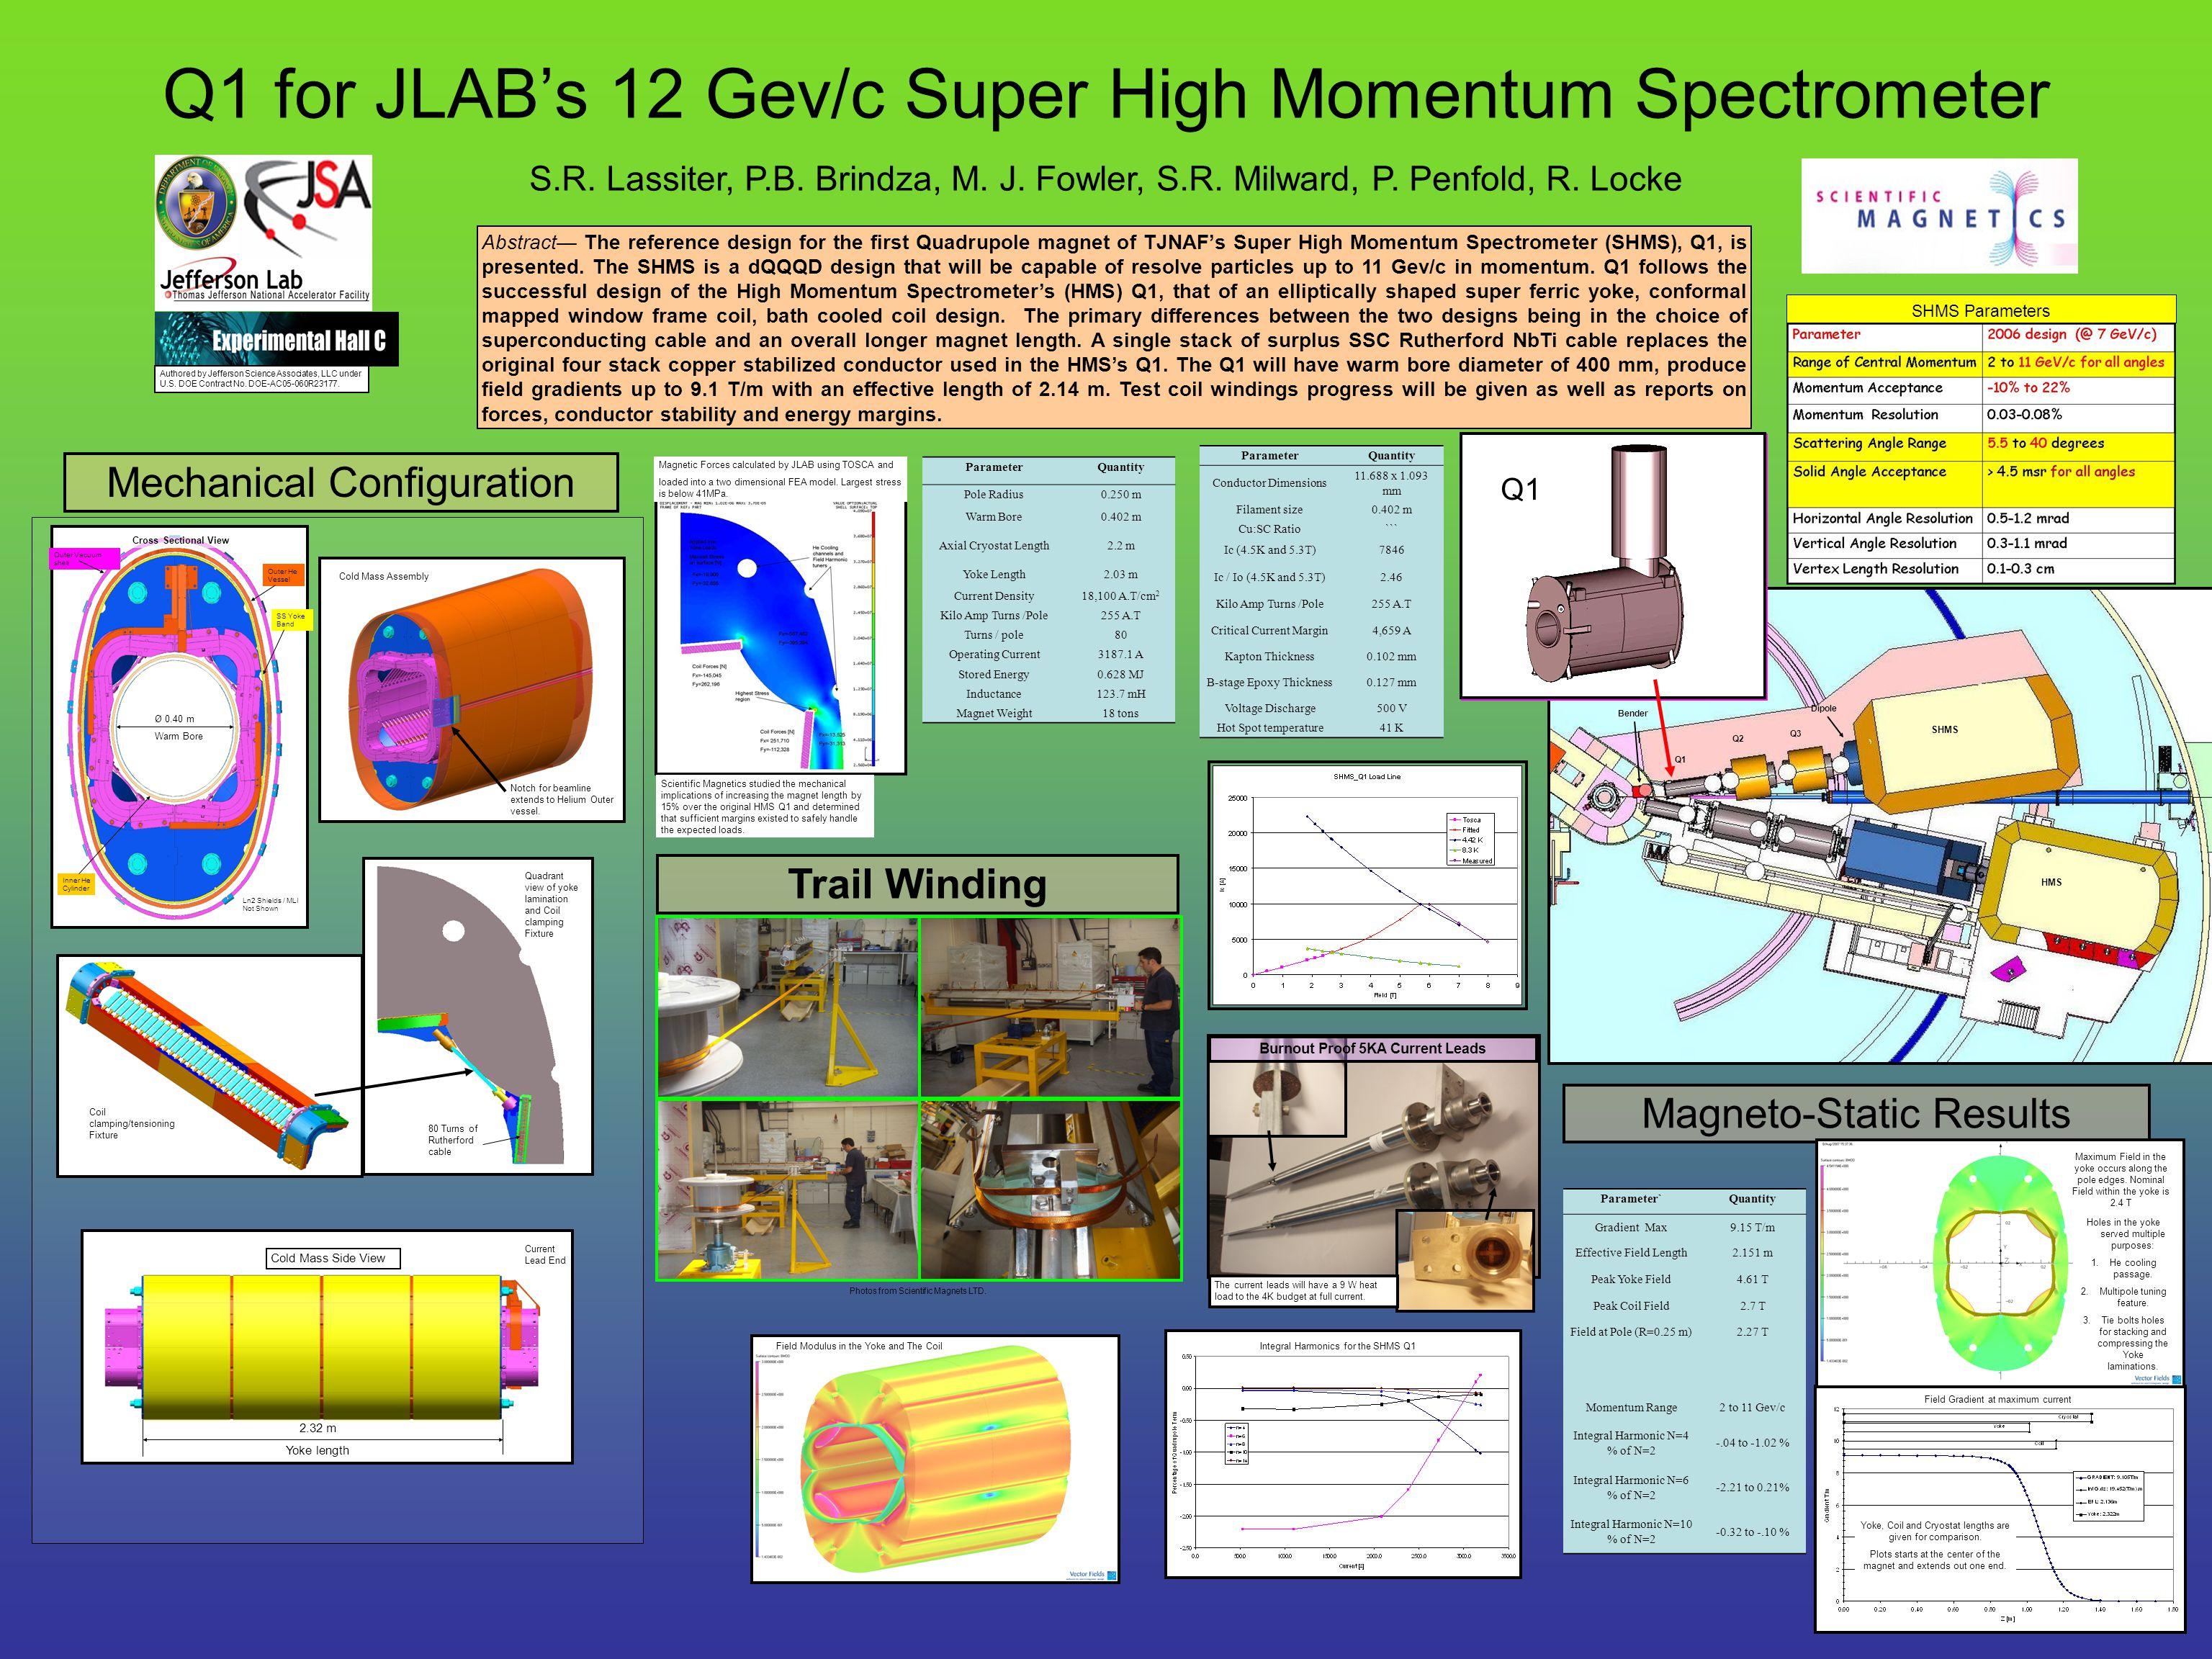 Q1 for JLAB's 12 Gev/c Super High Momentum Spectrometer S.R.